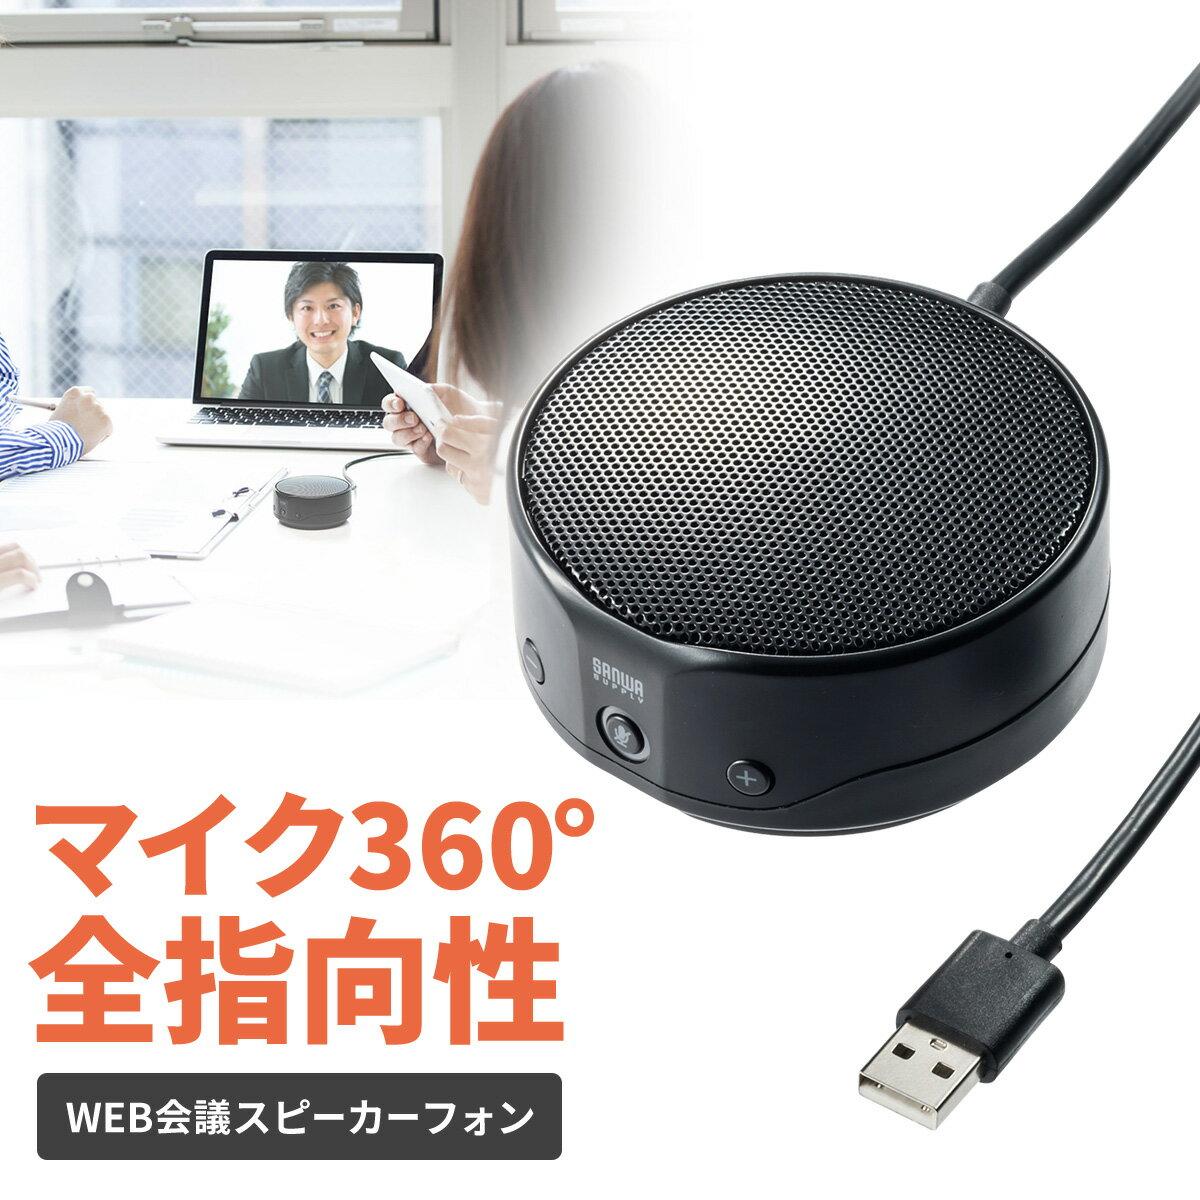 WEB会議スピーカーフォン(スピーカー/マイク・Skype対応・USB接続)[400-MC012]【サンワダイレクト限定品】【送料無料】